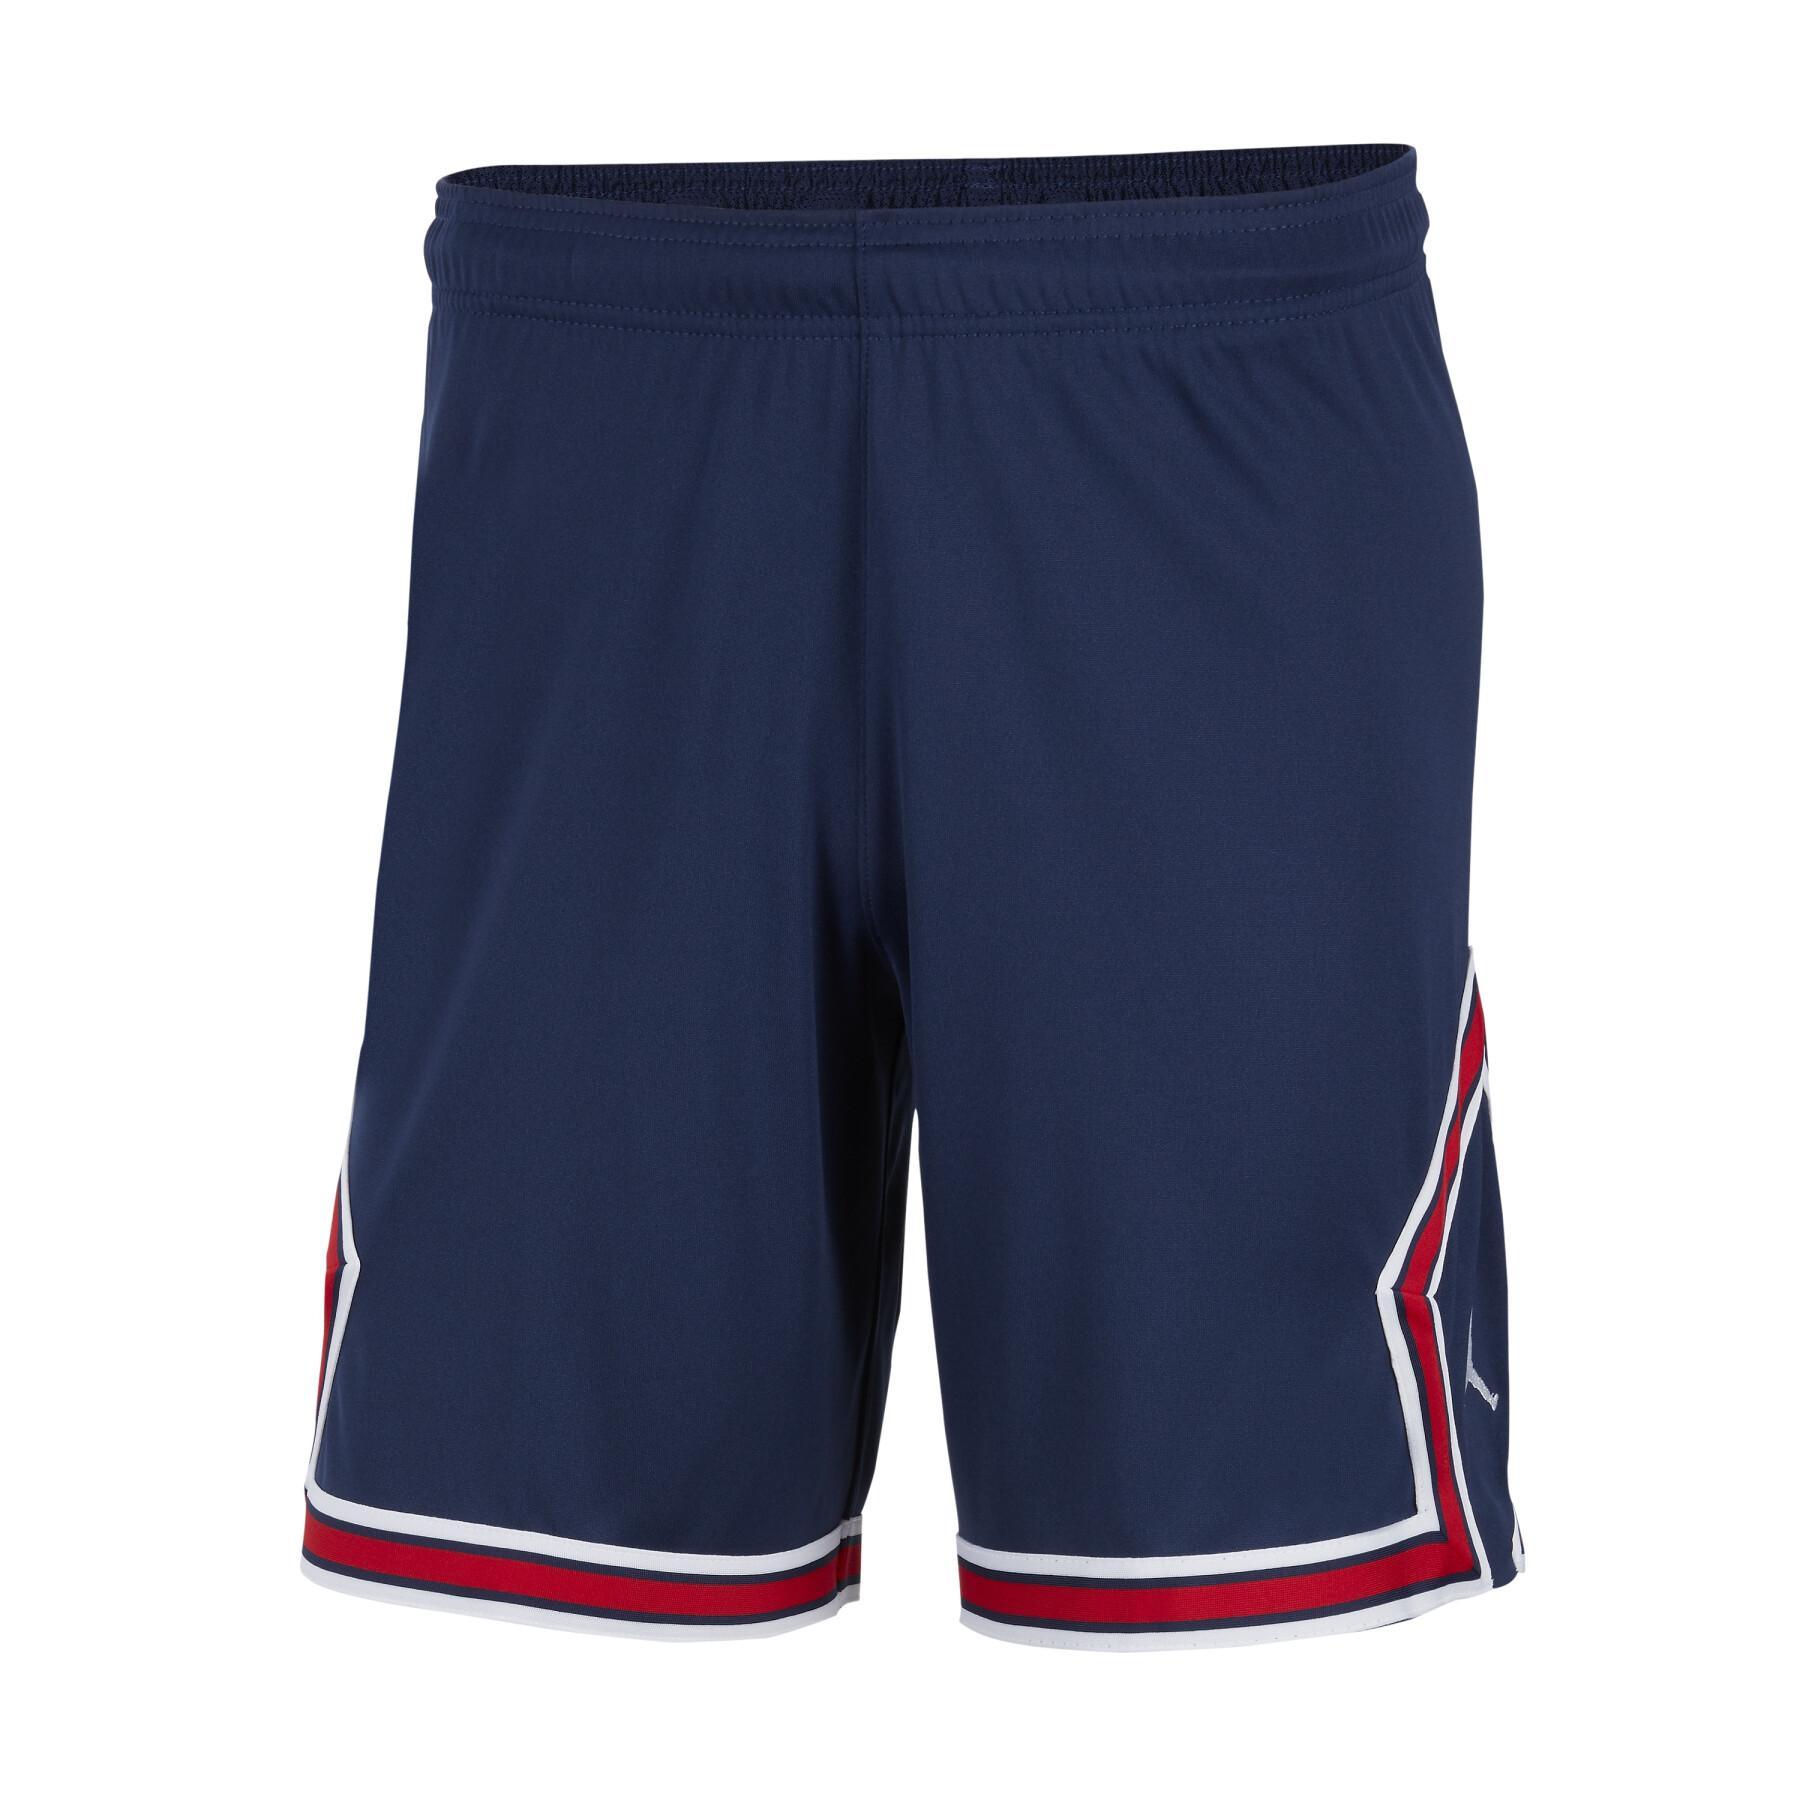 Home shorts PSG 2021/22